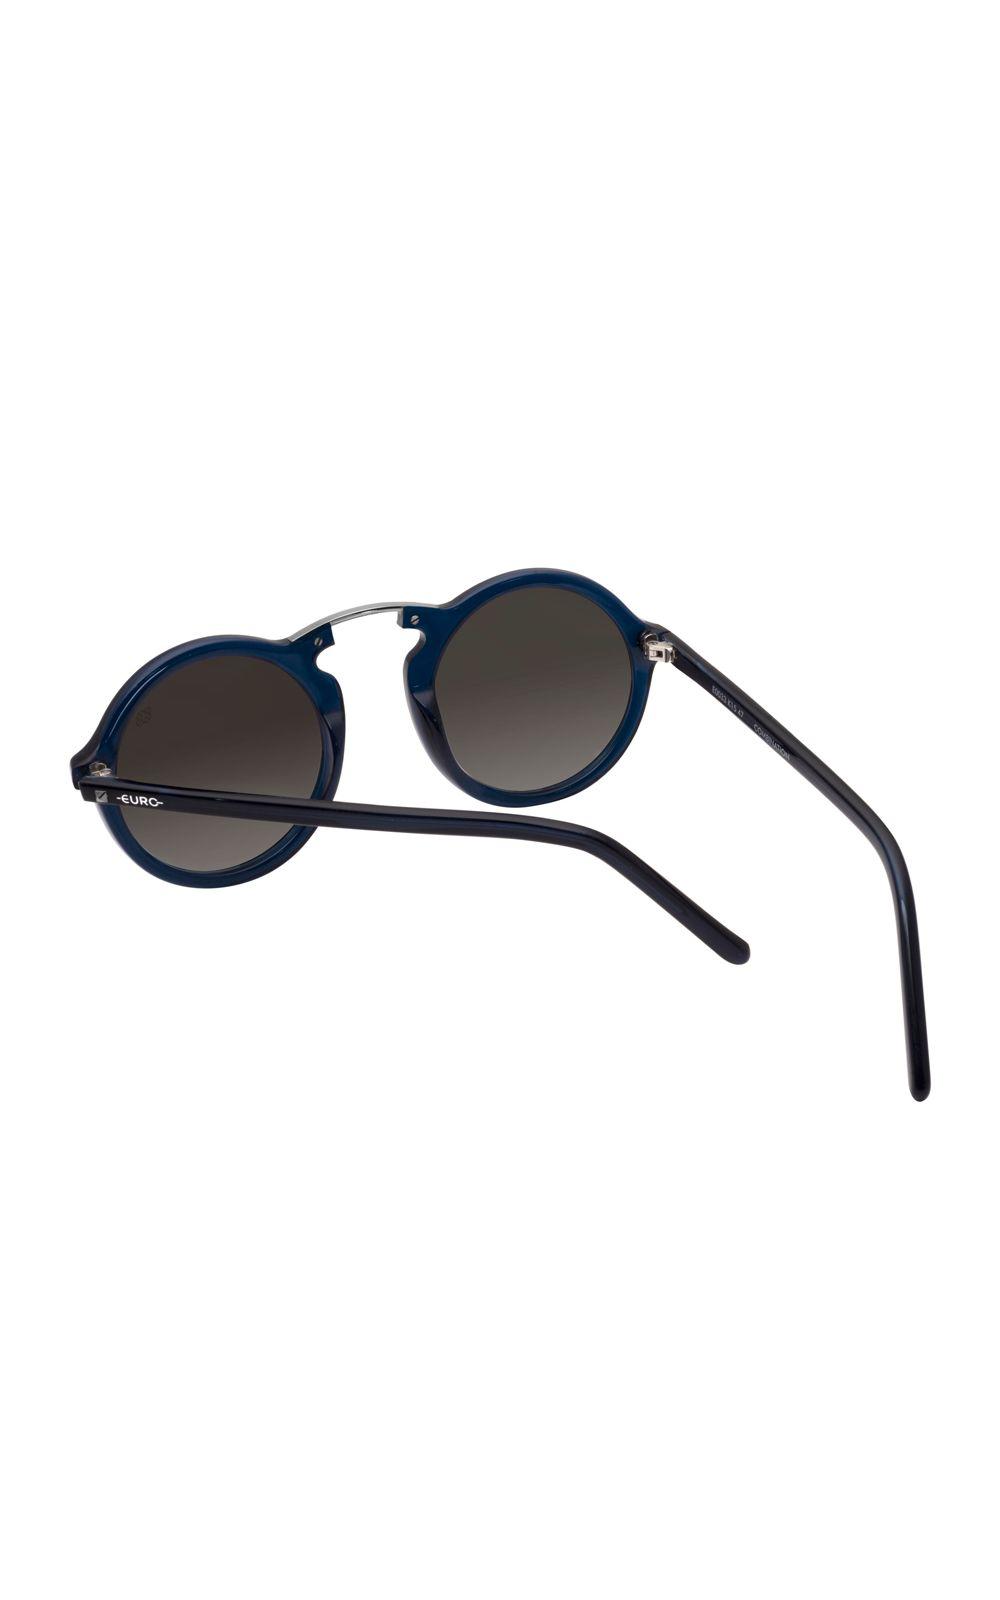 Foto 3 - Óculos Euro Casual Vintage Feminino Azul E0033K1547/8C